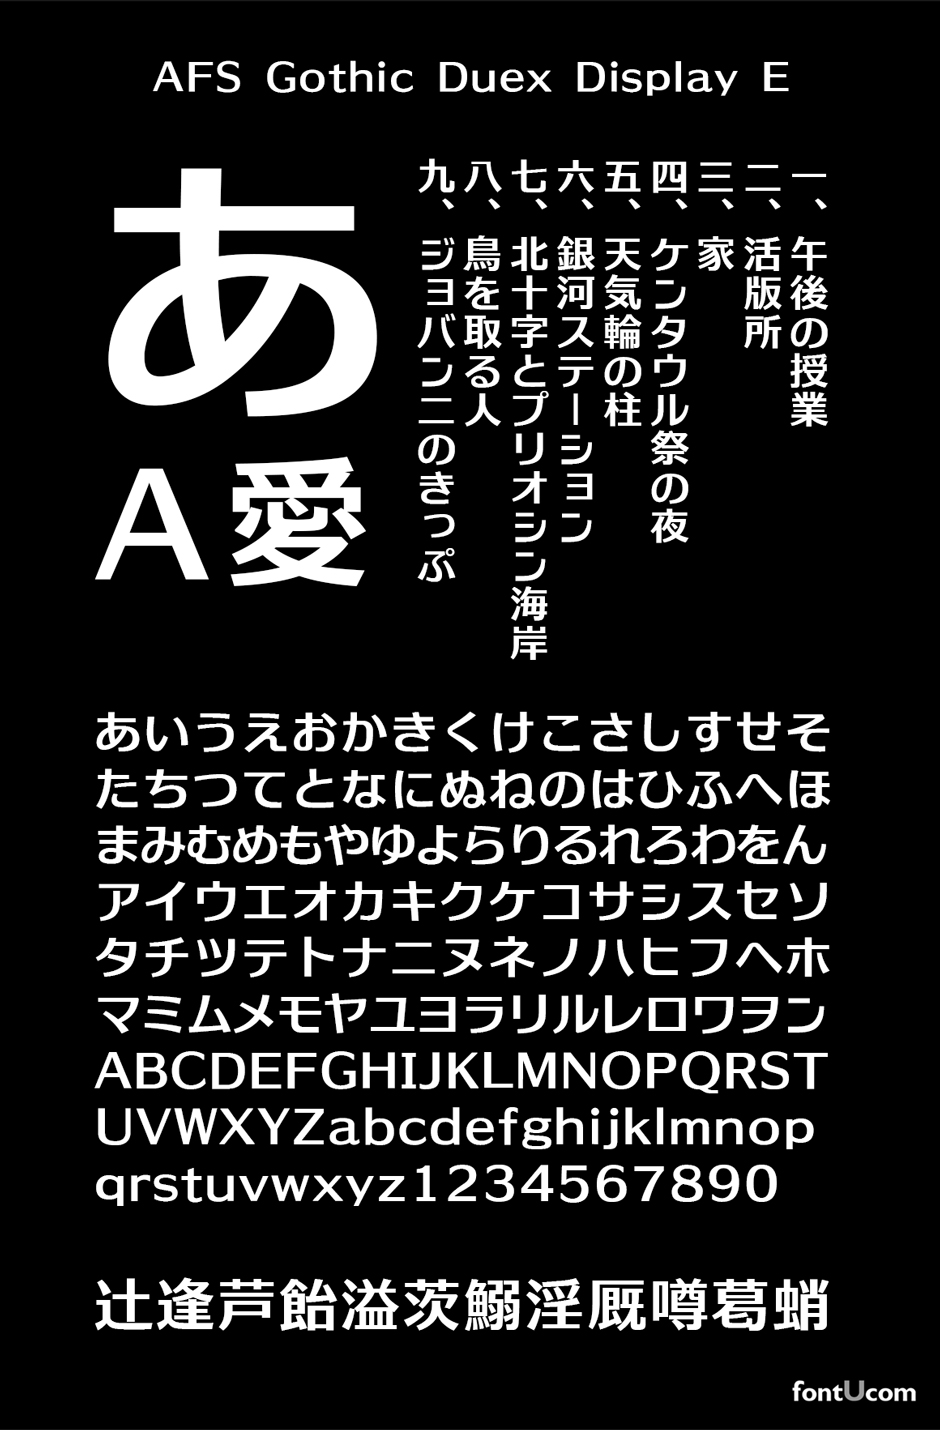 AFS GothicDuex Display E